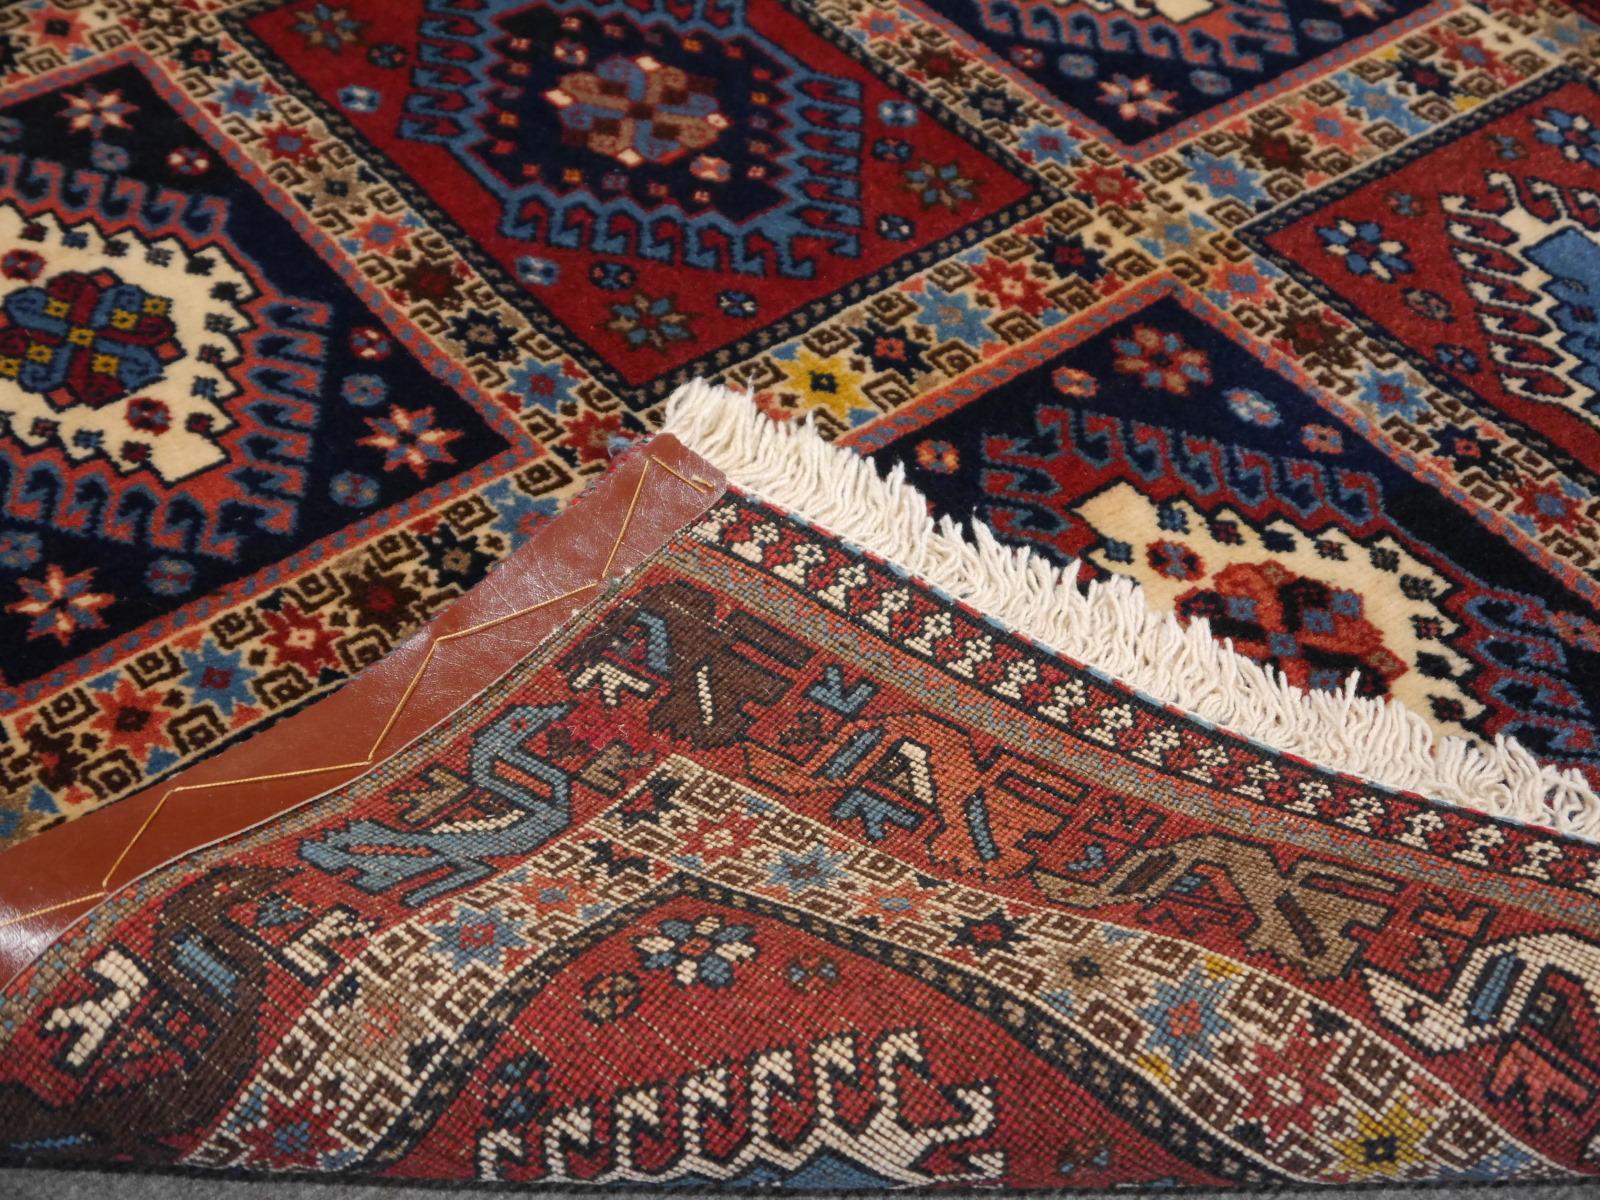 13817 yalameh persian carpet 4 8 x 3 3 ft 147 x 102 cm. Black Bedroom Furniture Sets. Home Design Ideas